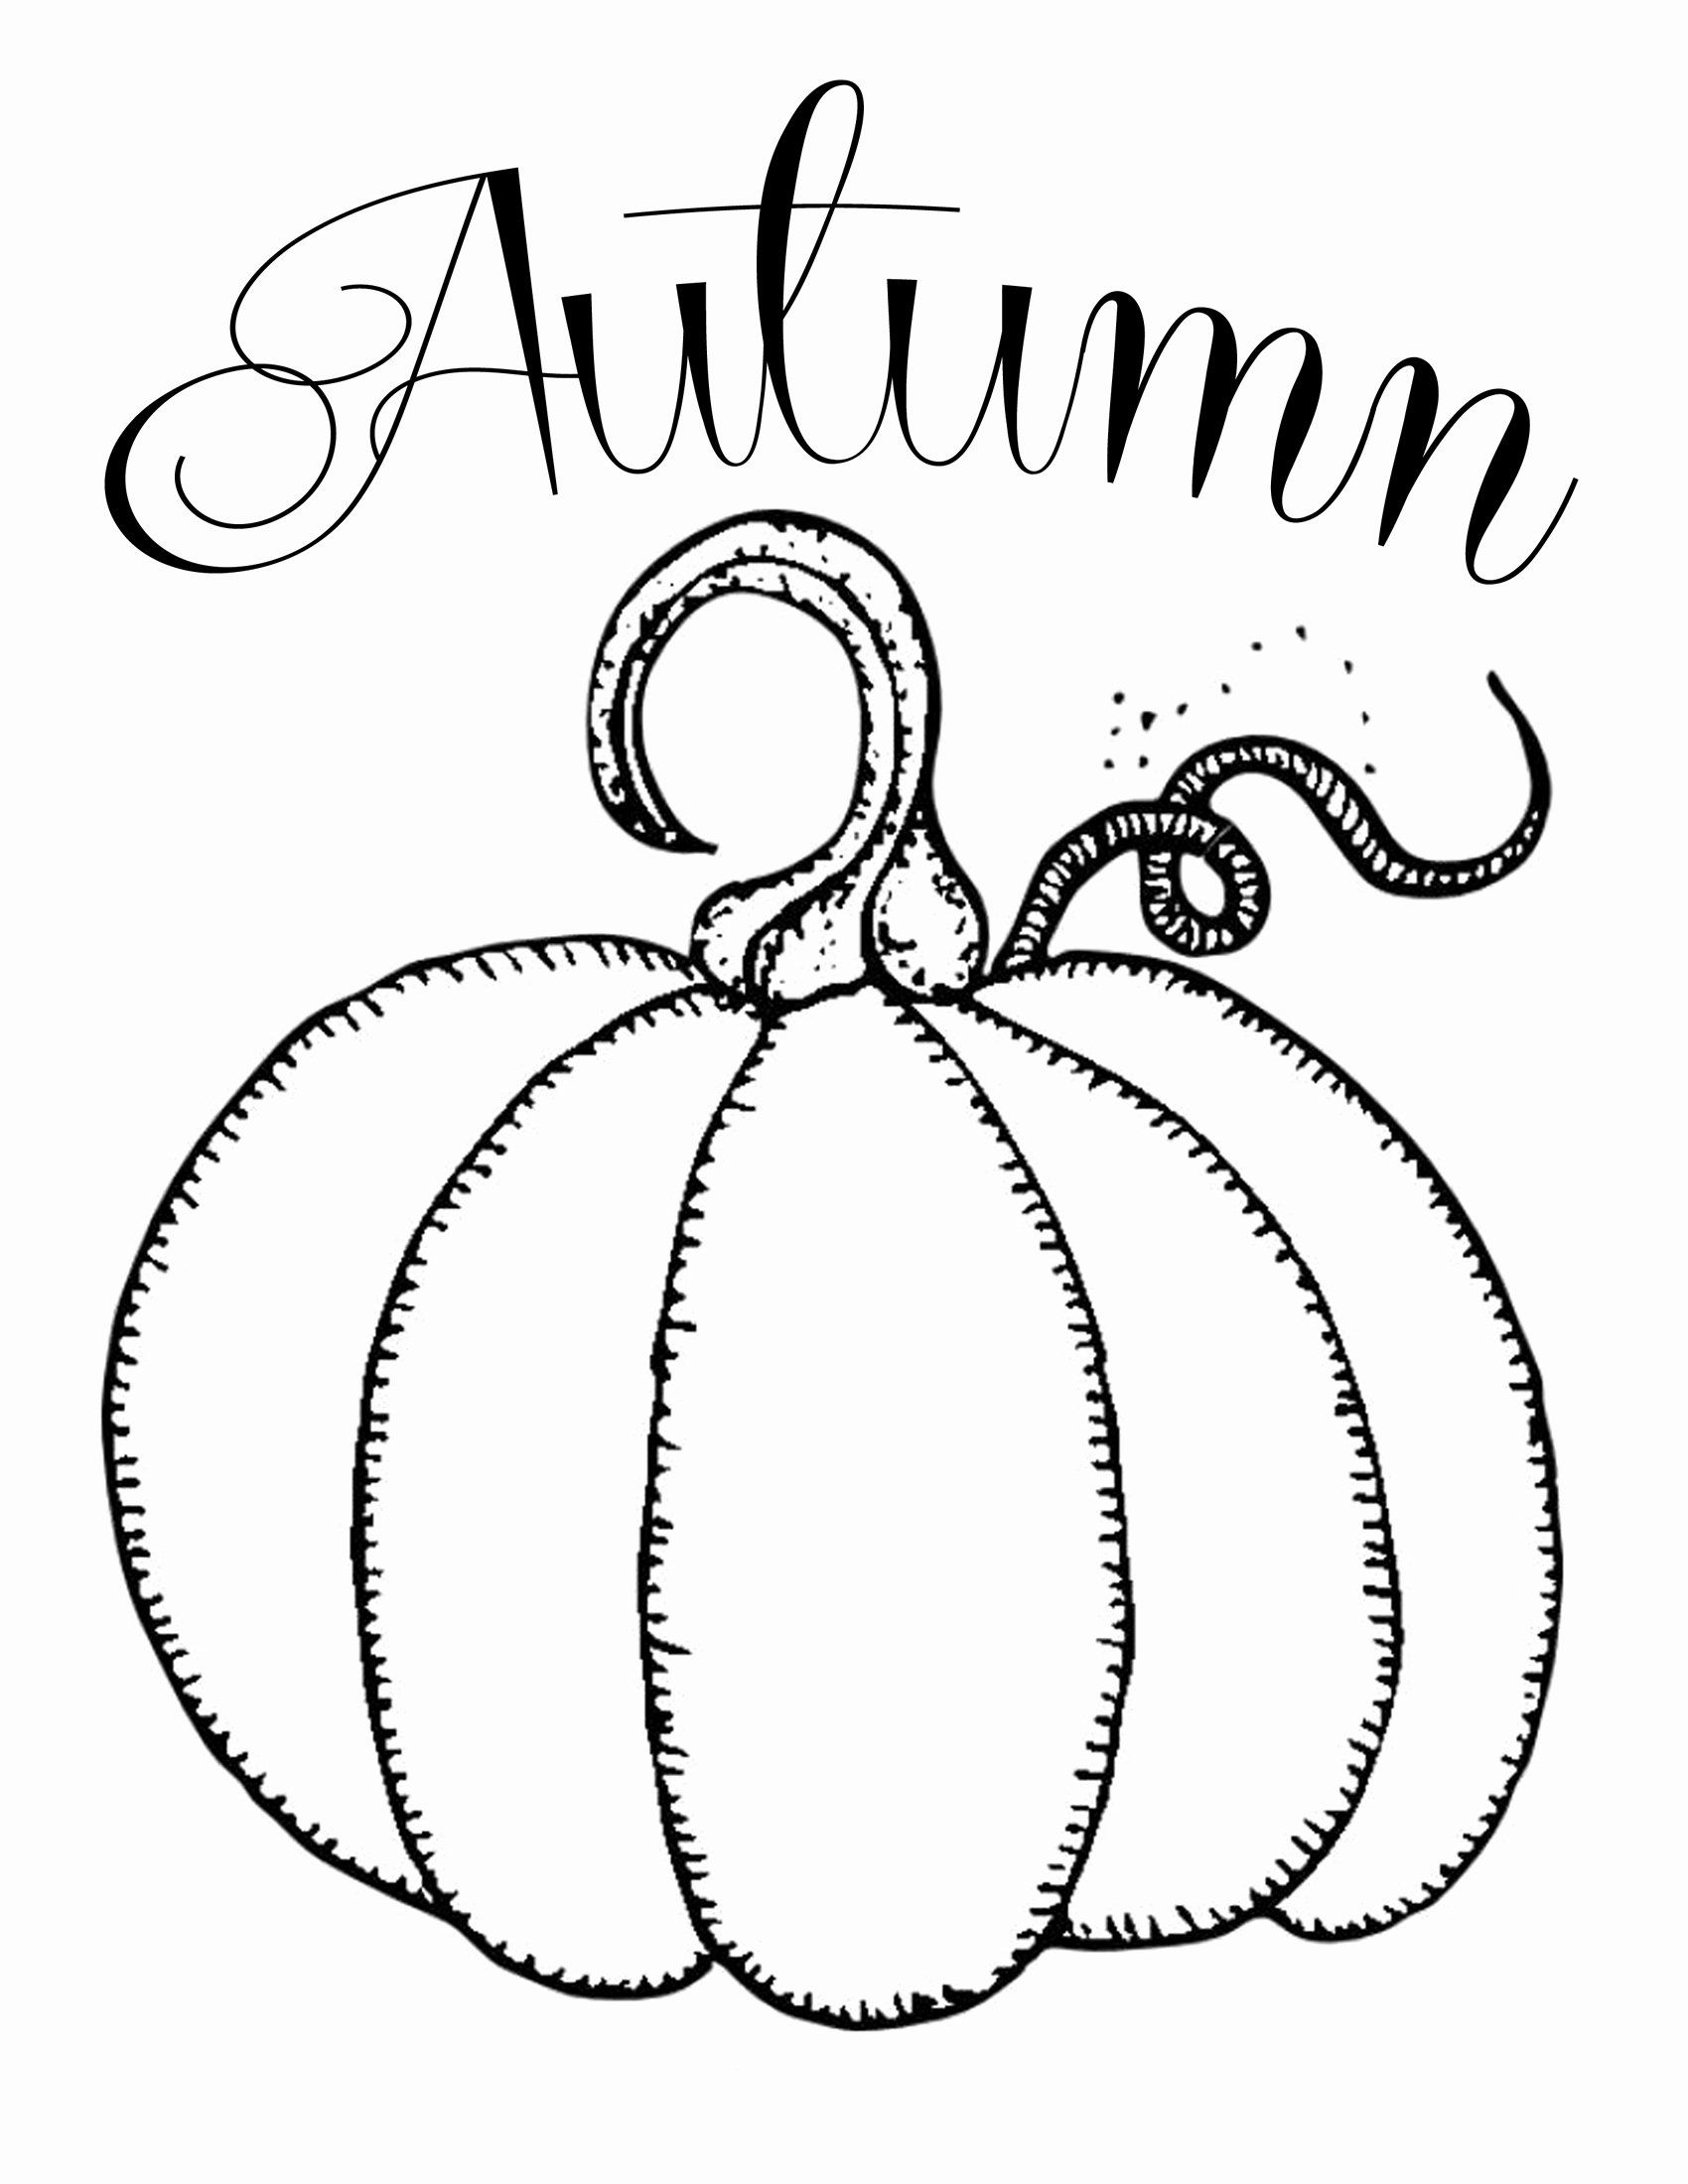 Halloween Pumpkin Coloring Sheet Lovely Coloring Pages Pumpkins Coloring Rocks Free Pumpkin Autumn In 2020 Fall Coloring Pages Pumpkin Coloring Pages Pumpkin Printable